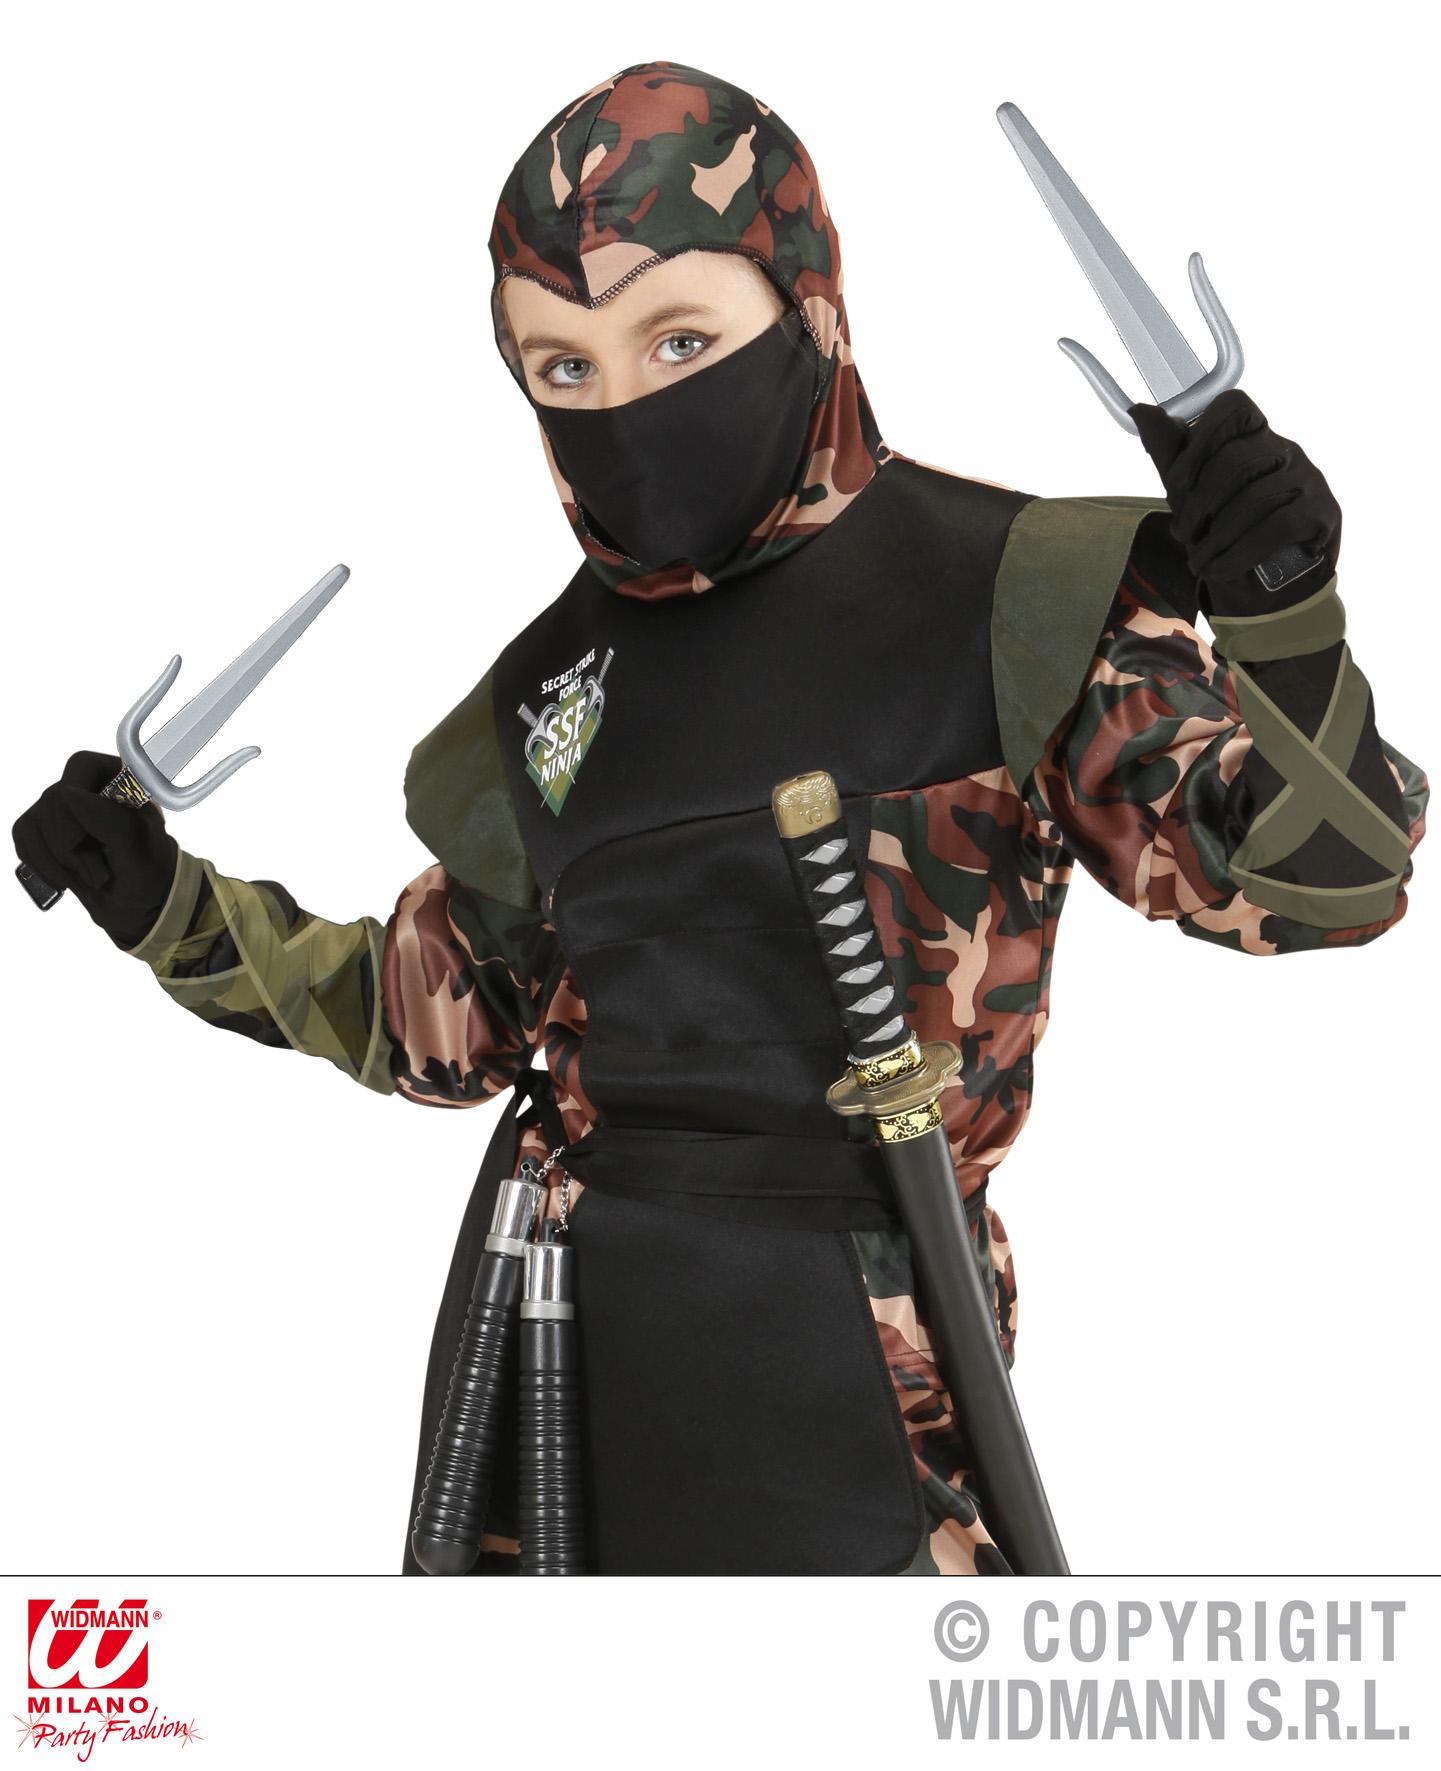 4 tlg.Ninja Samurai Zubehör, Sai u. Shuriken, Asien, Japan  Spielzeug